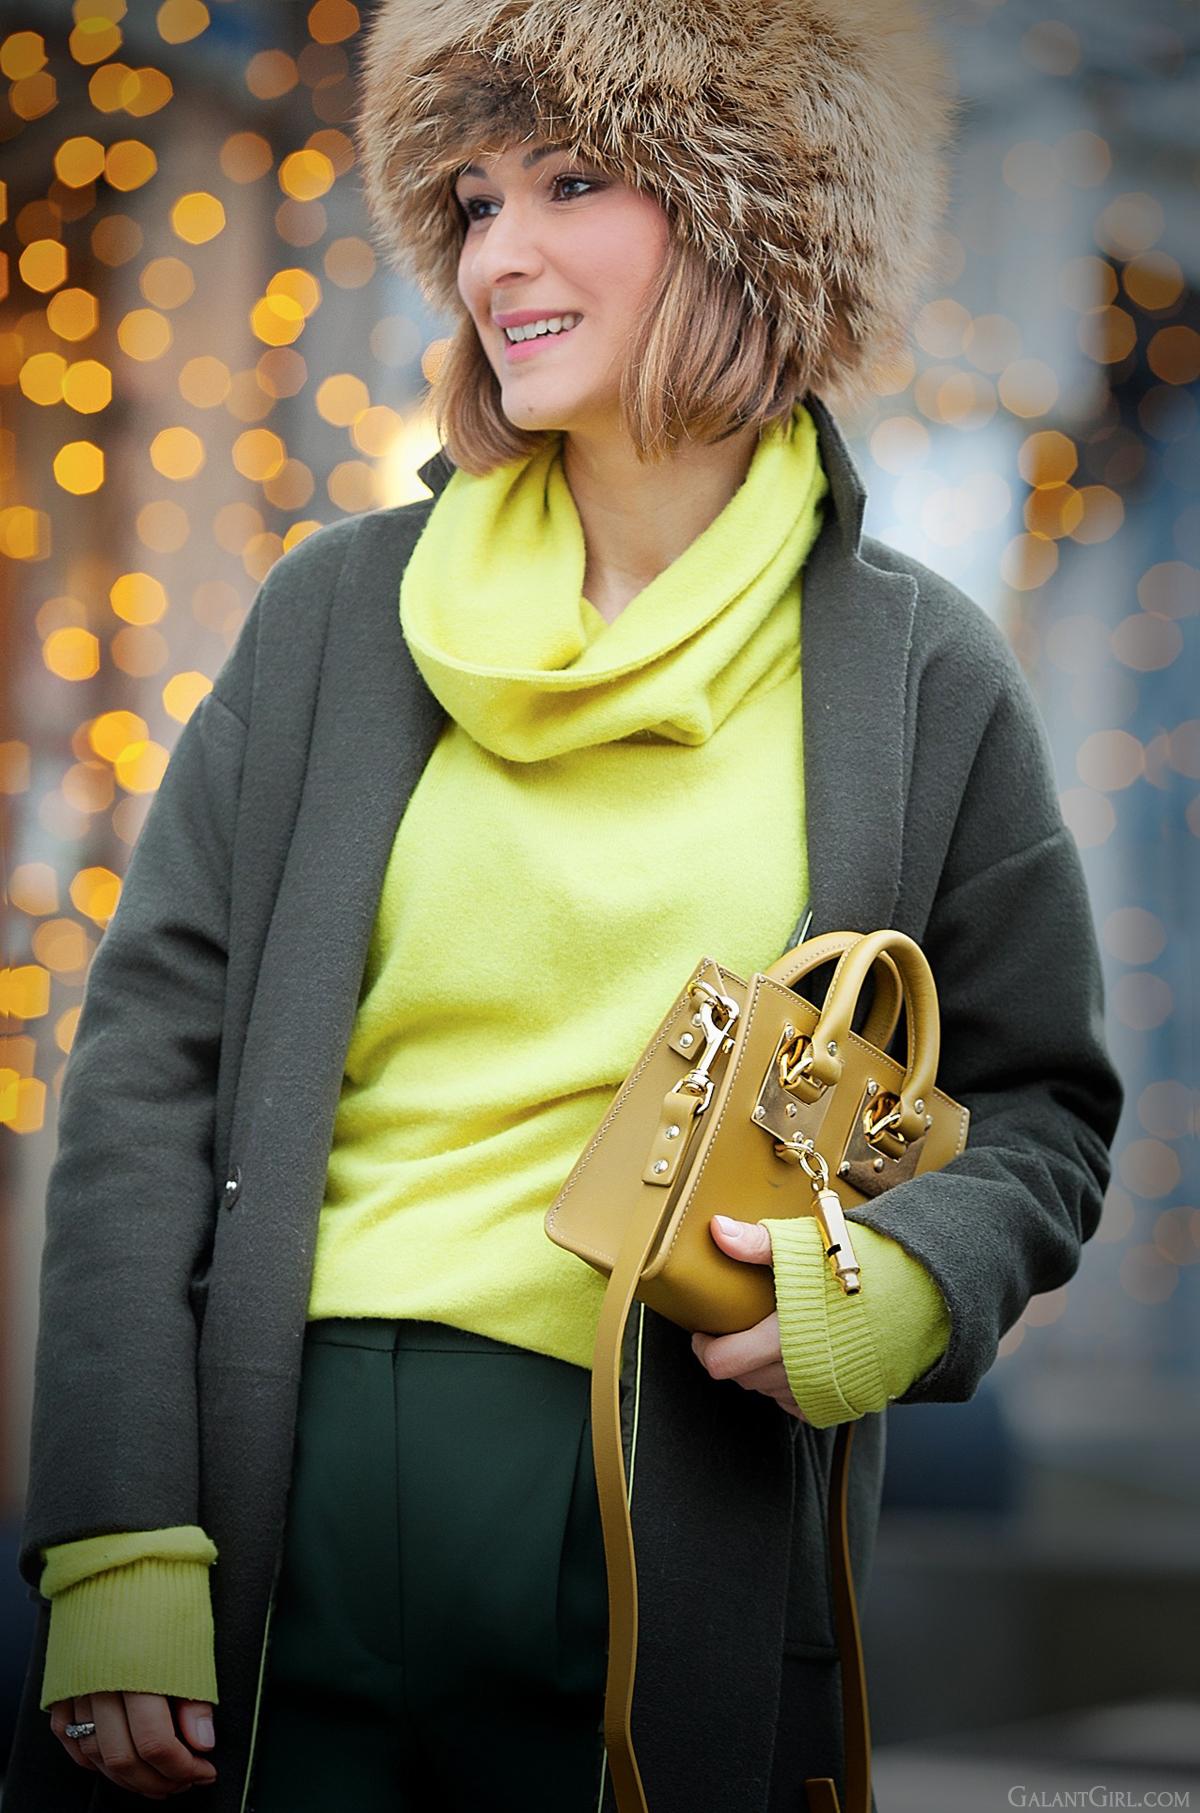 sophie hulme mini olive bag, sophie hulme olive bag, olive colors outfit, winter outfit, fox fur hat,